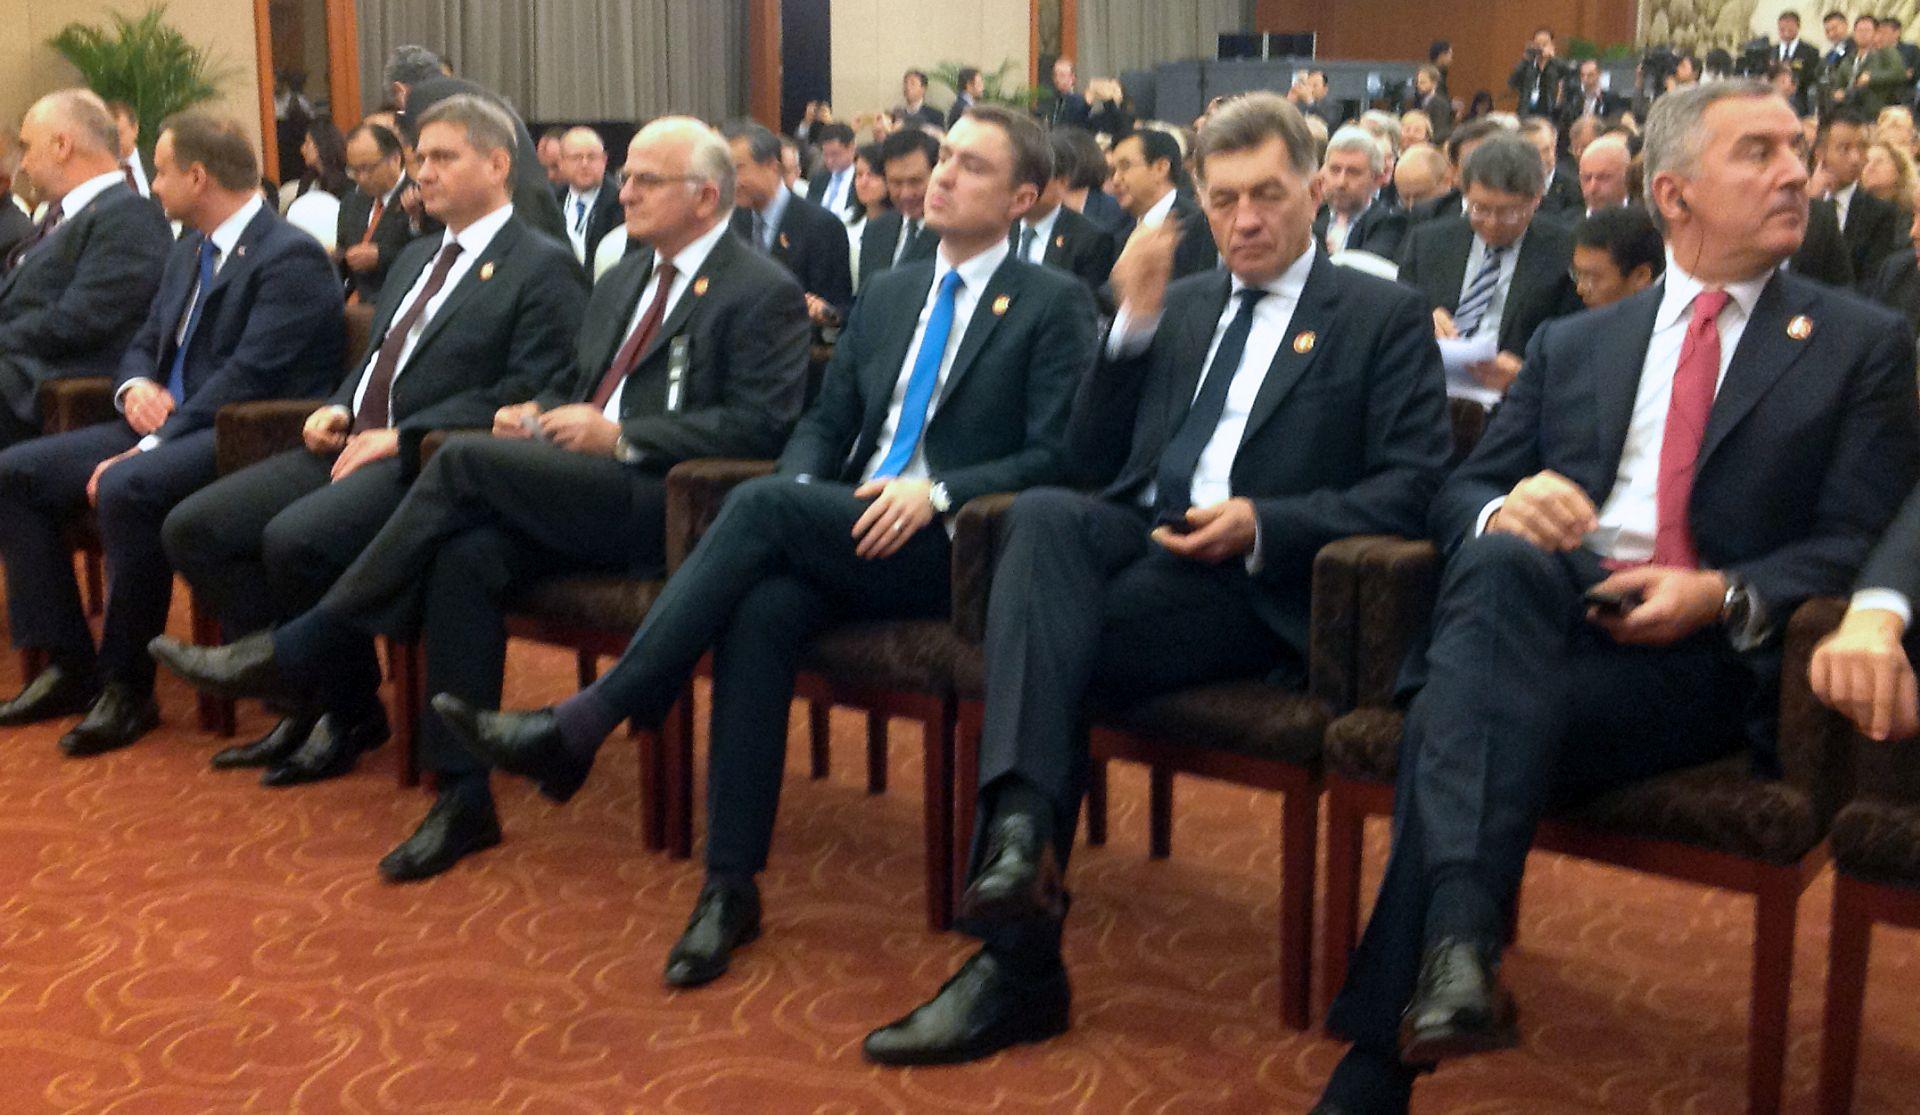 PROMICANJE DALJNJE SURADNJE: Leko na 5. gospodarskom i trgovinskom forumu